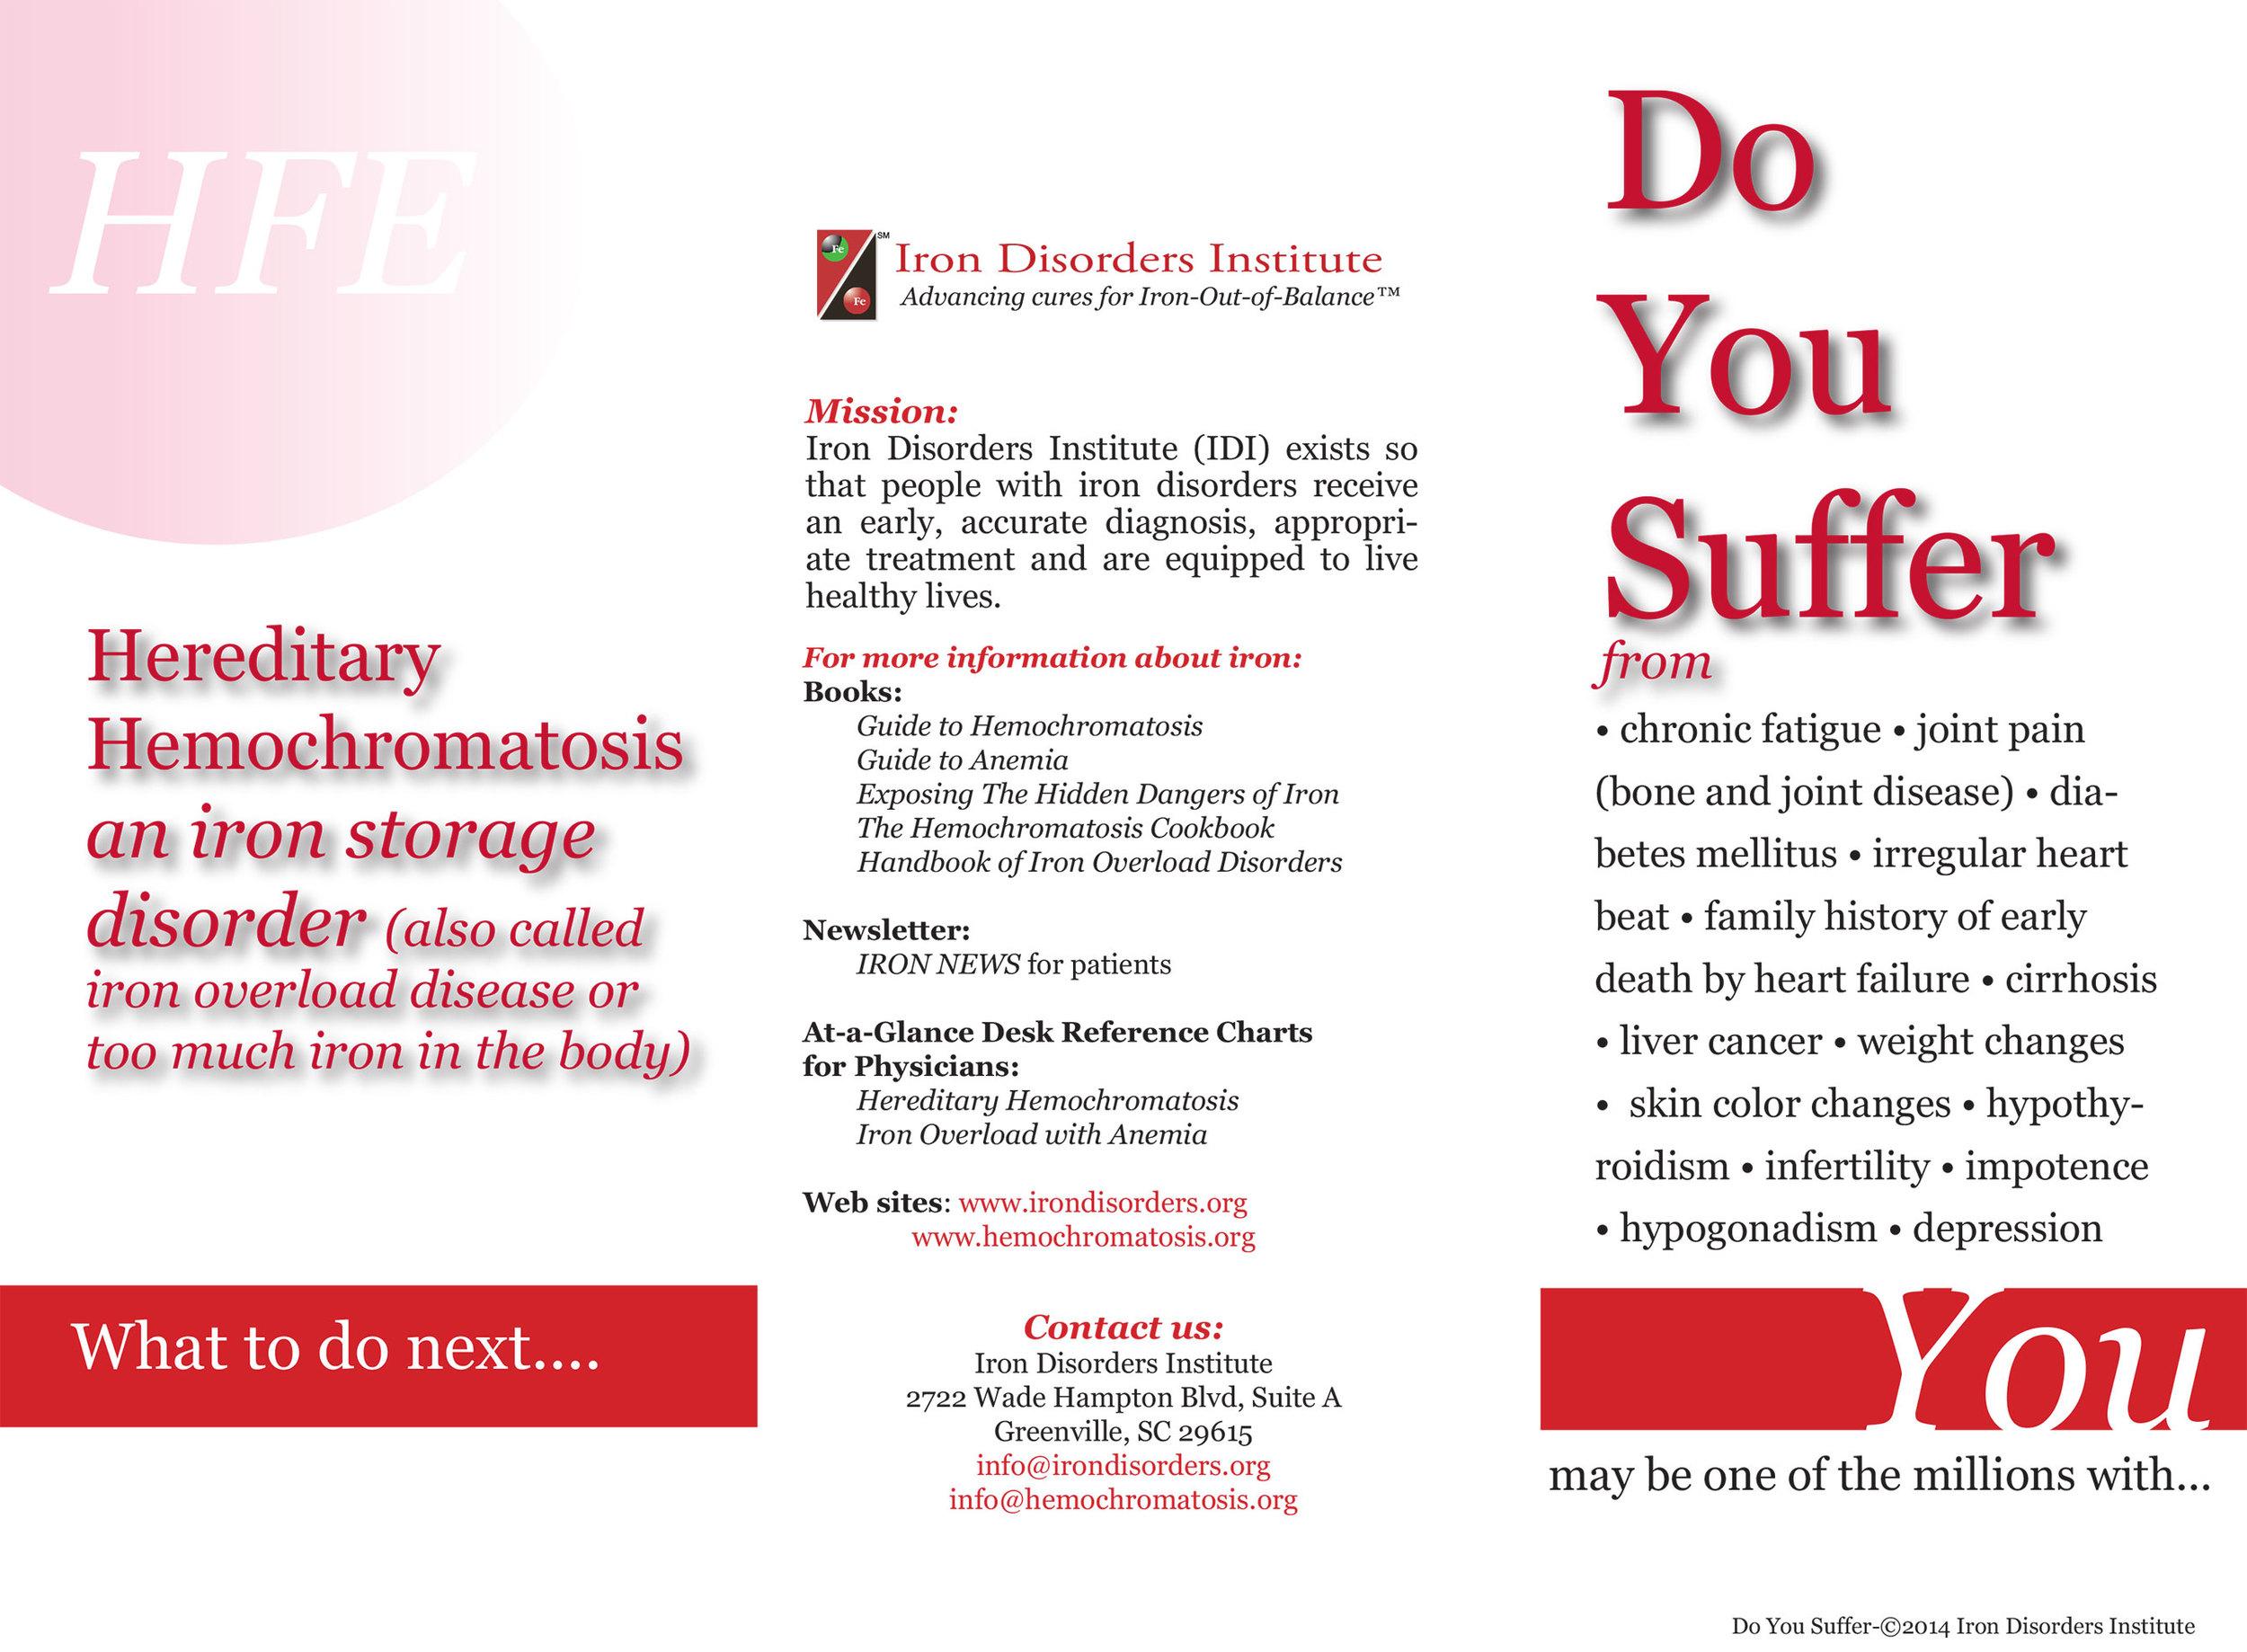 Hemochromatosis org - An Education Website for